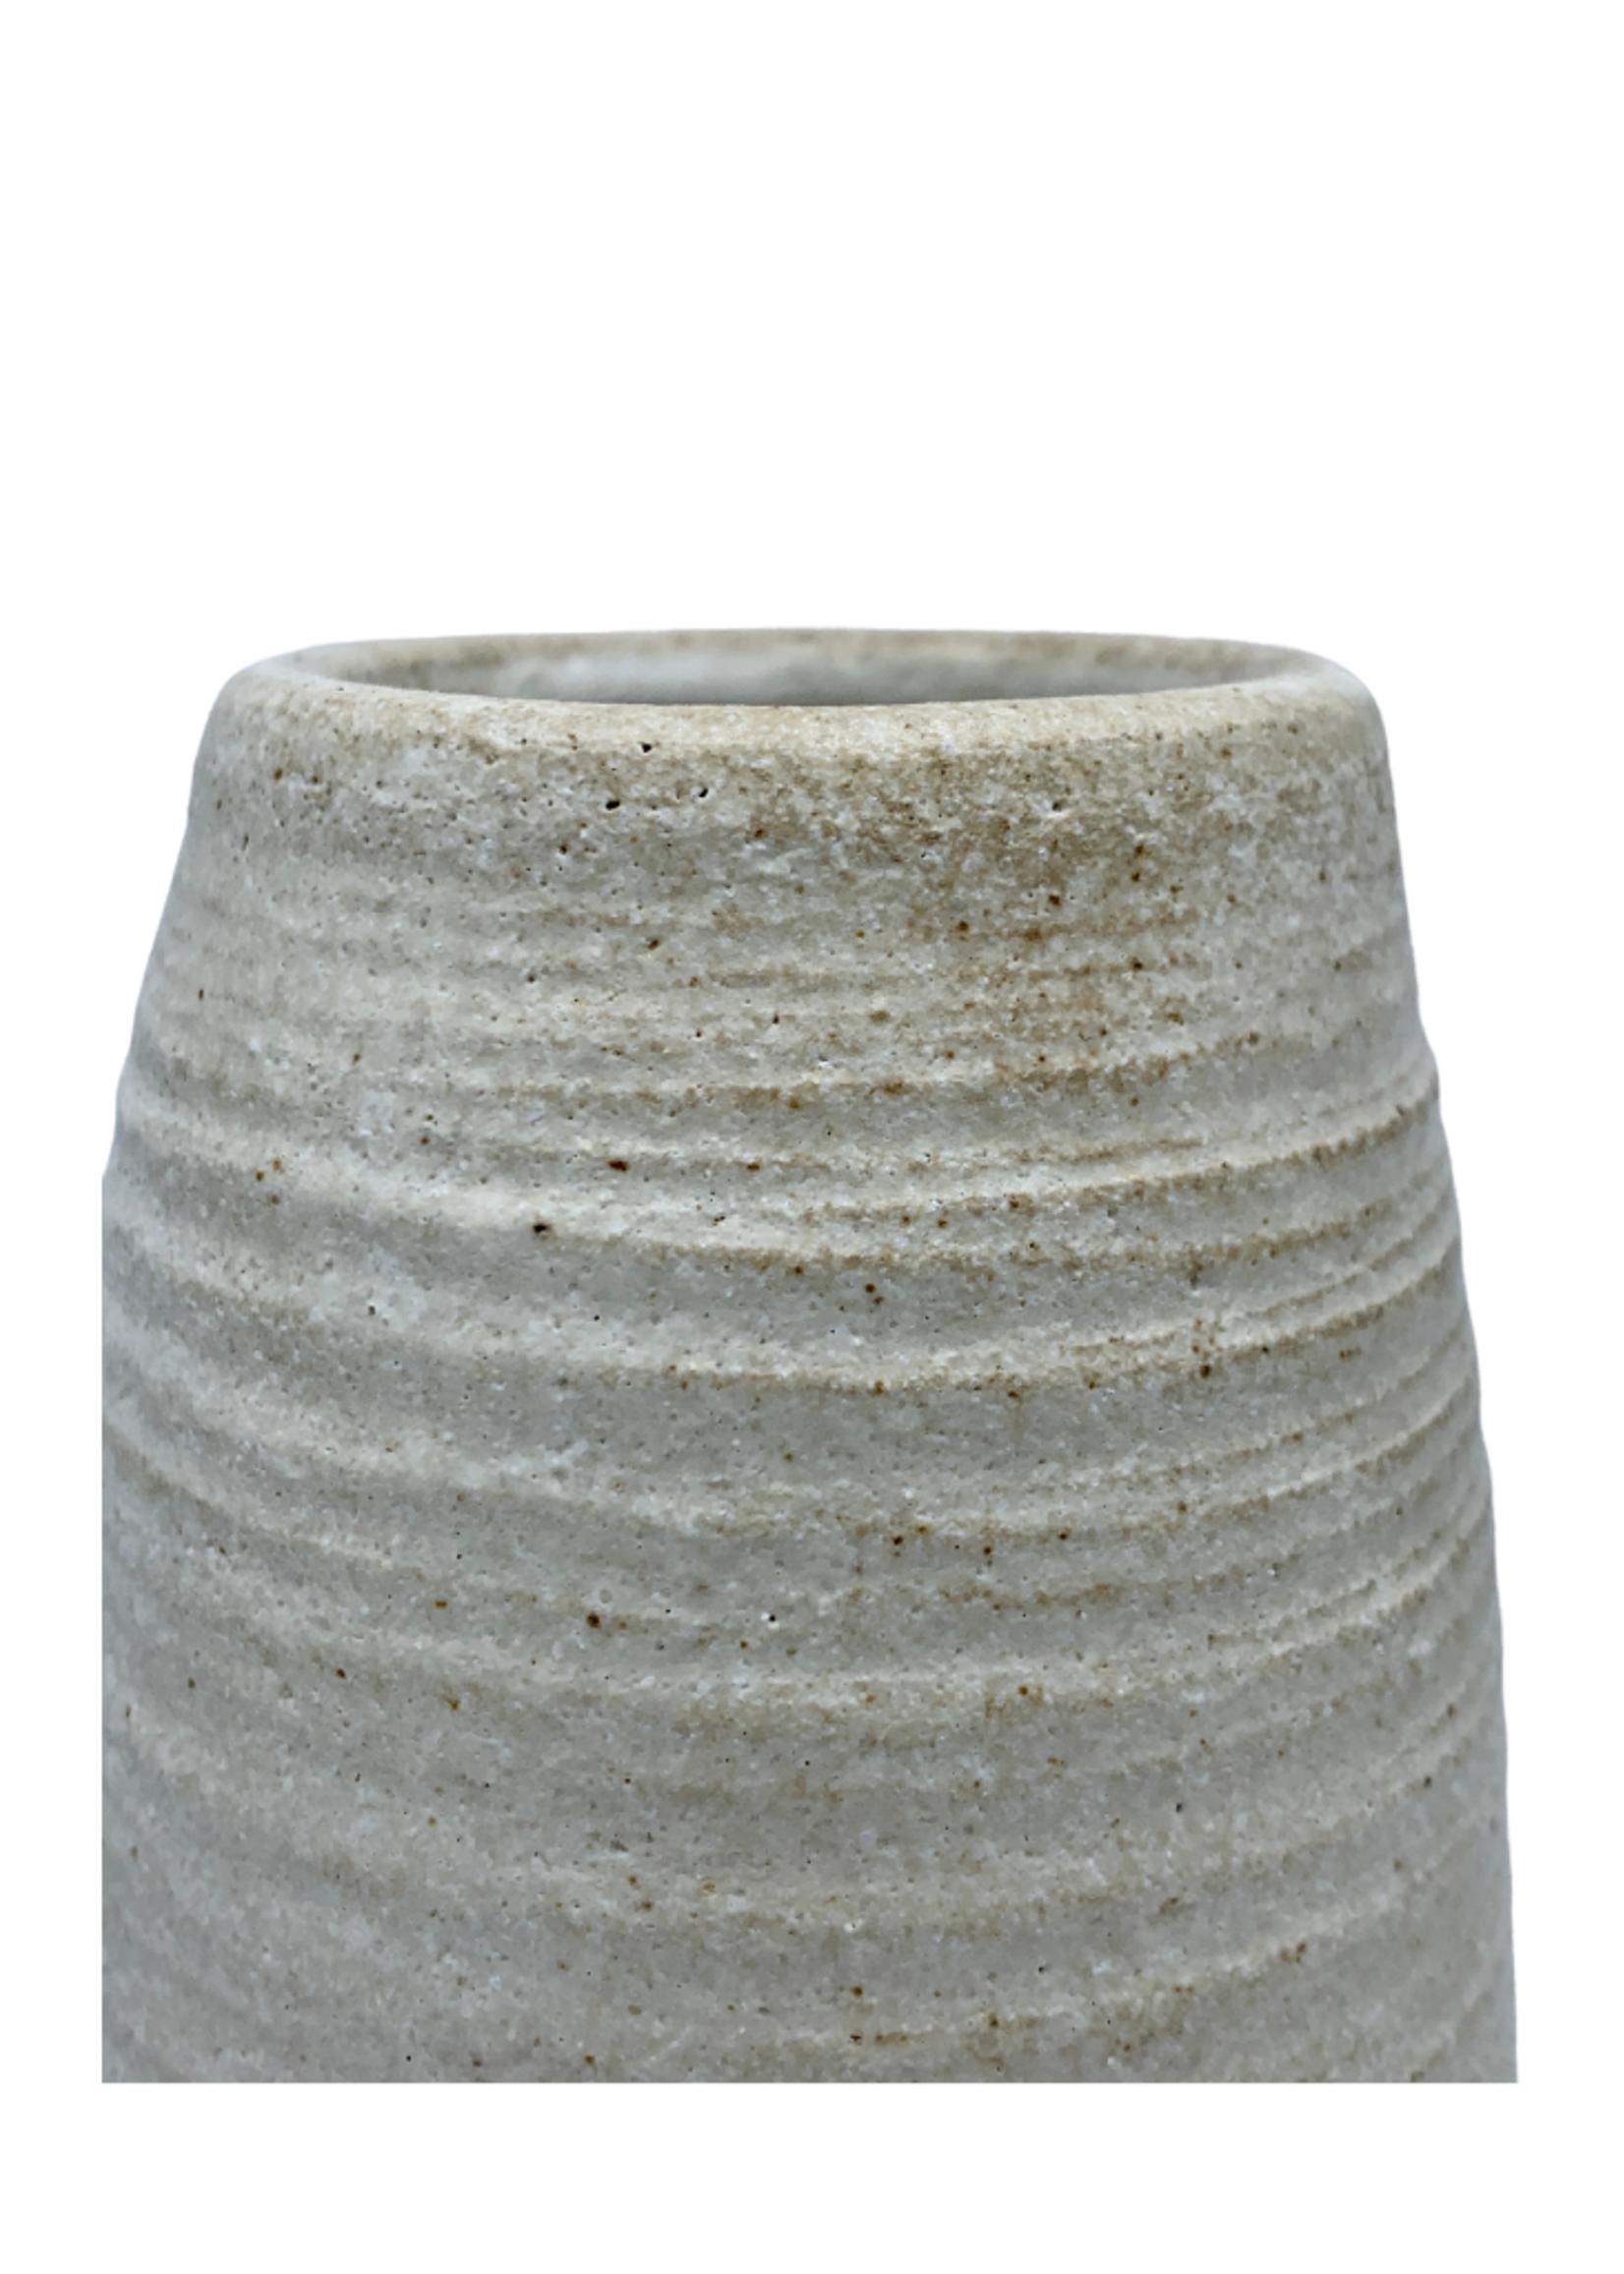 Richard Lau Pottery White Tower Gourd